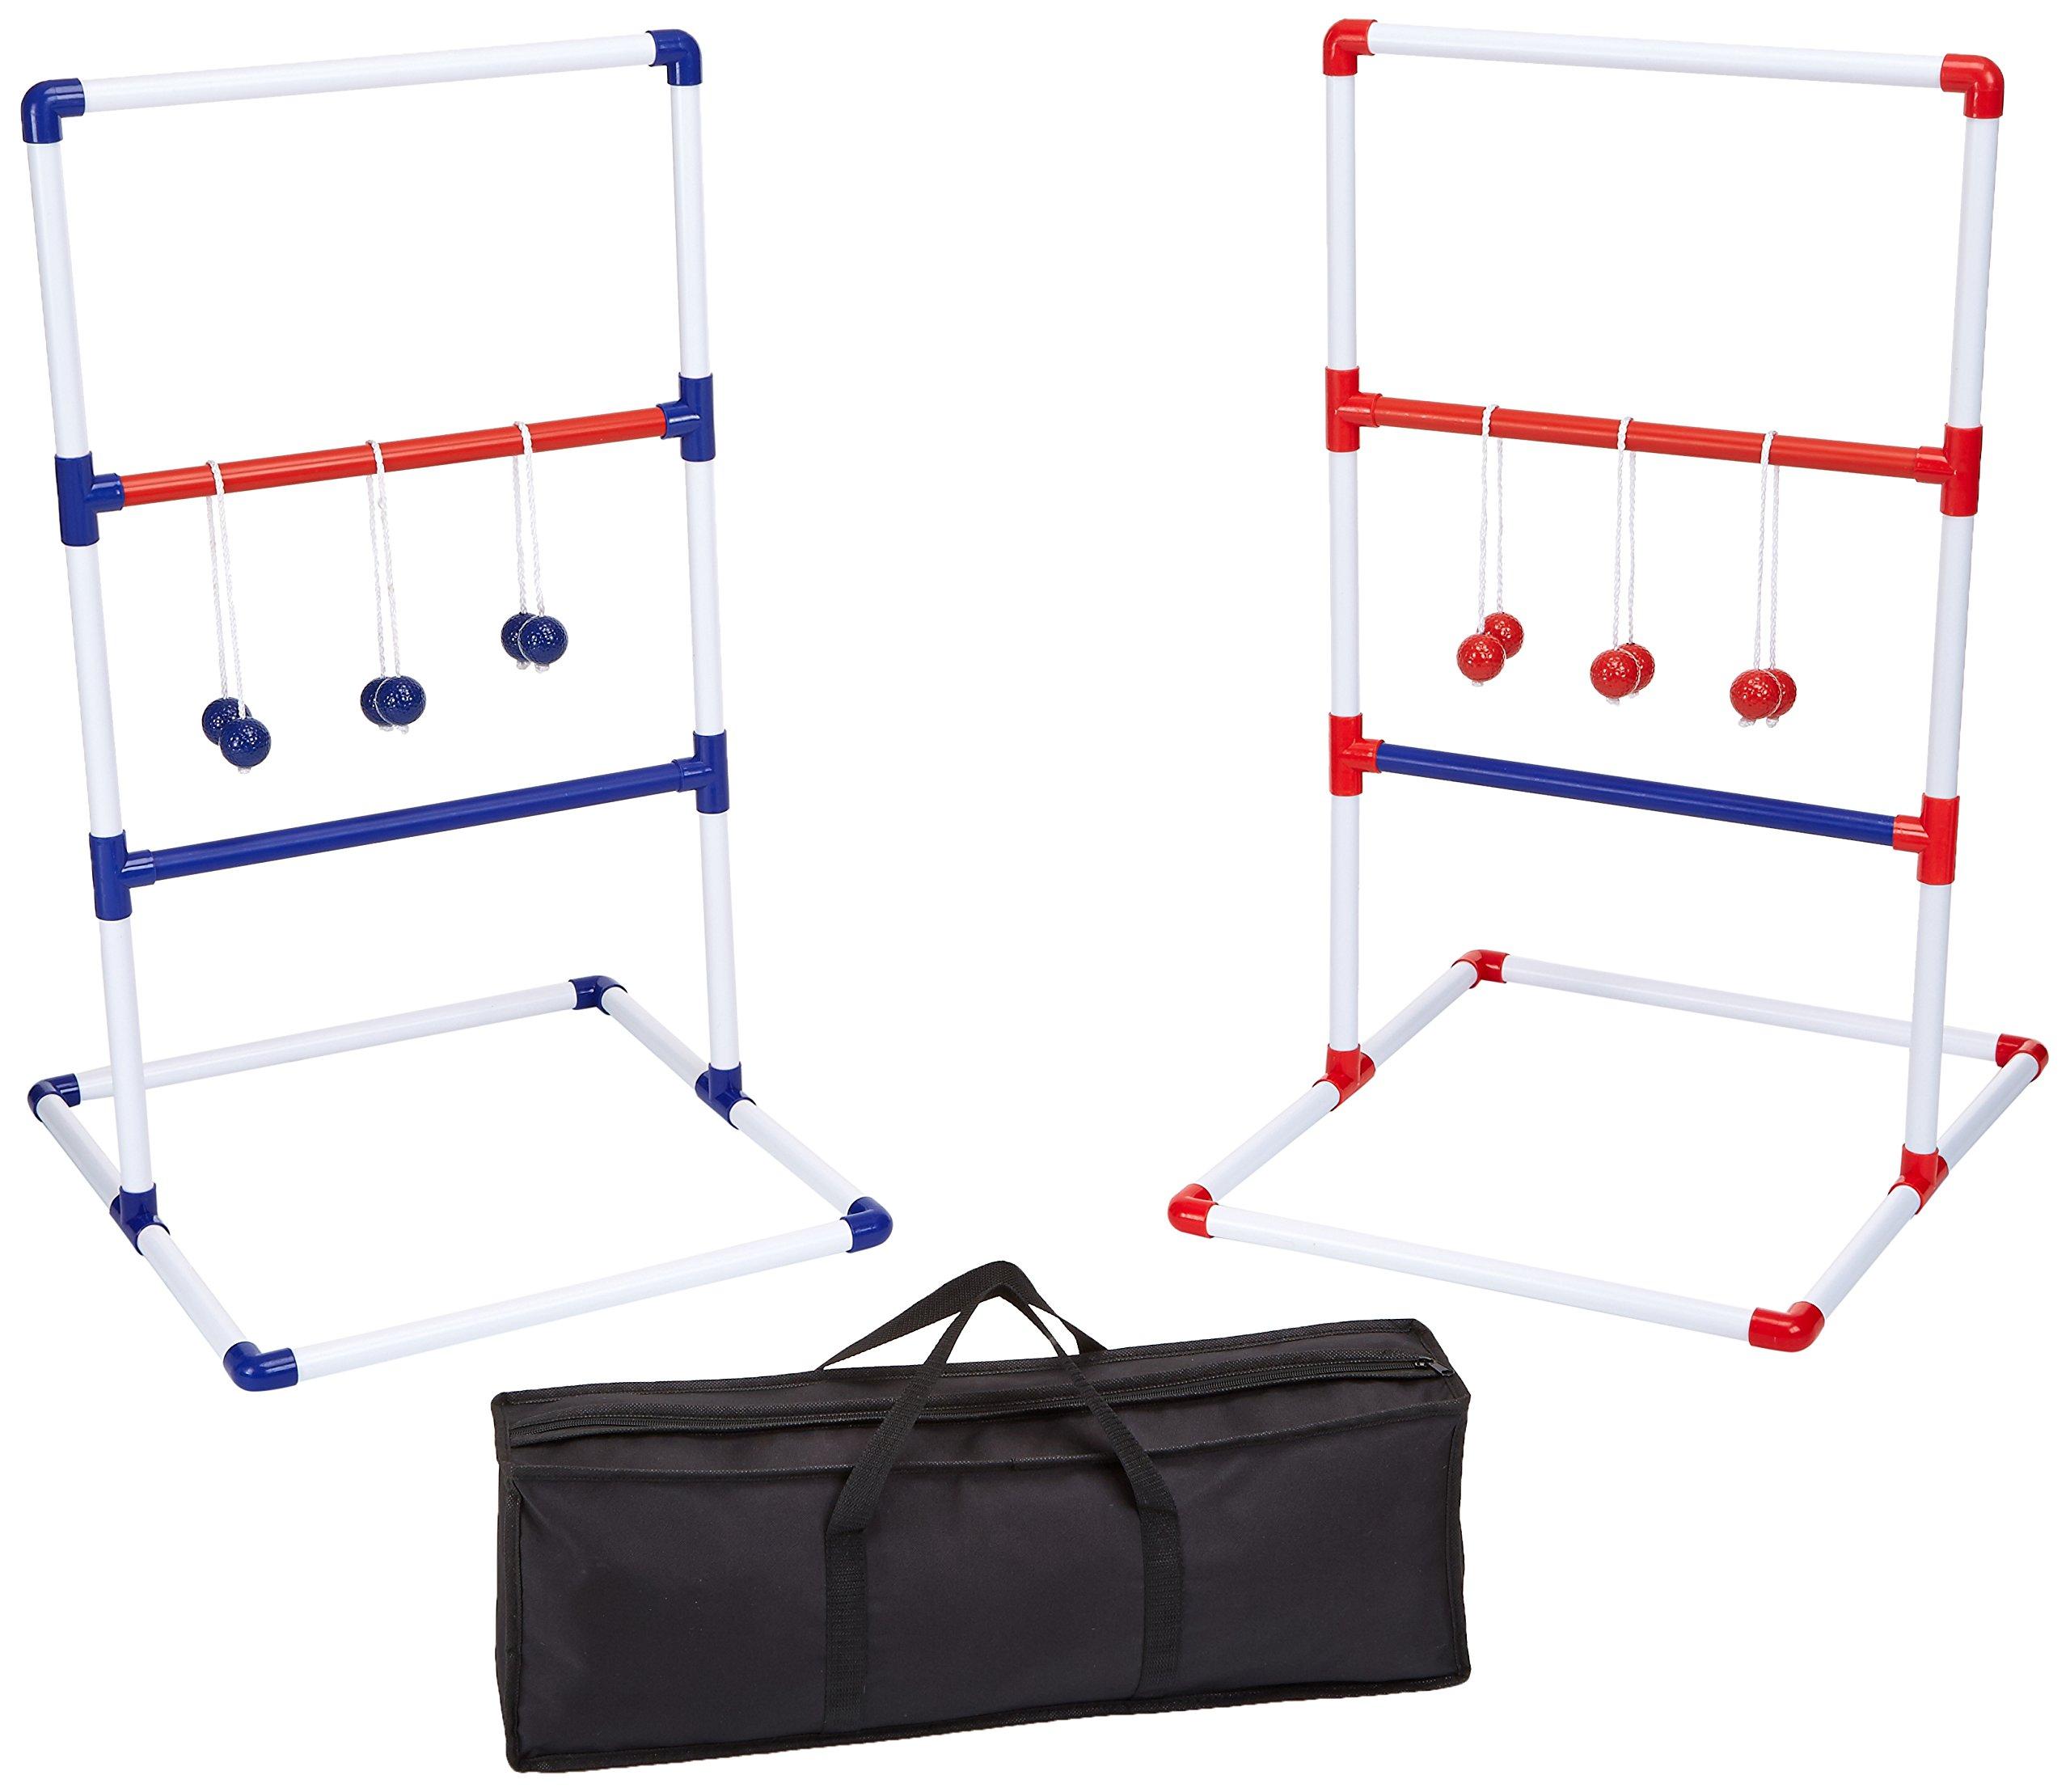 AmazonBasics Ladder Toss Outdoor Carrying